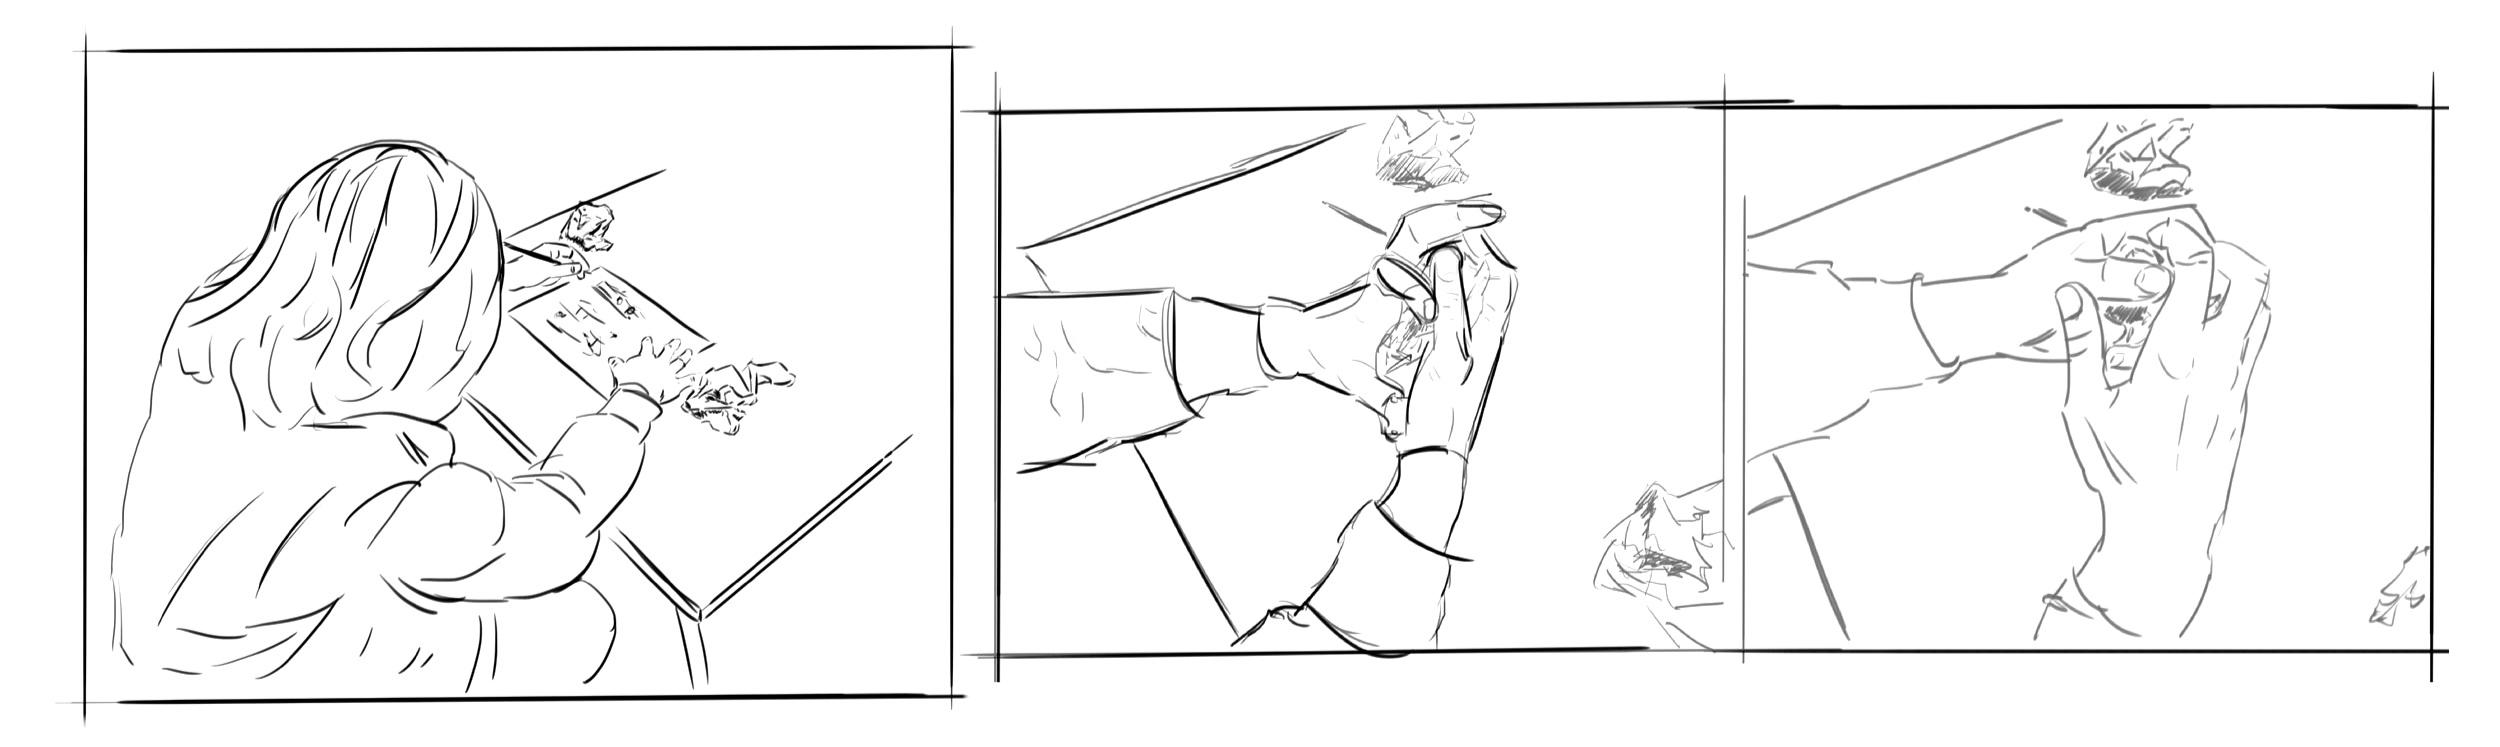 storyboard_slam+junk_1.jpg